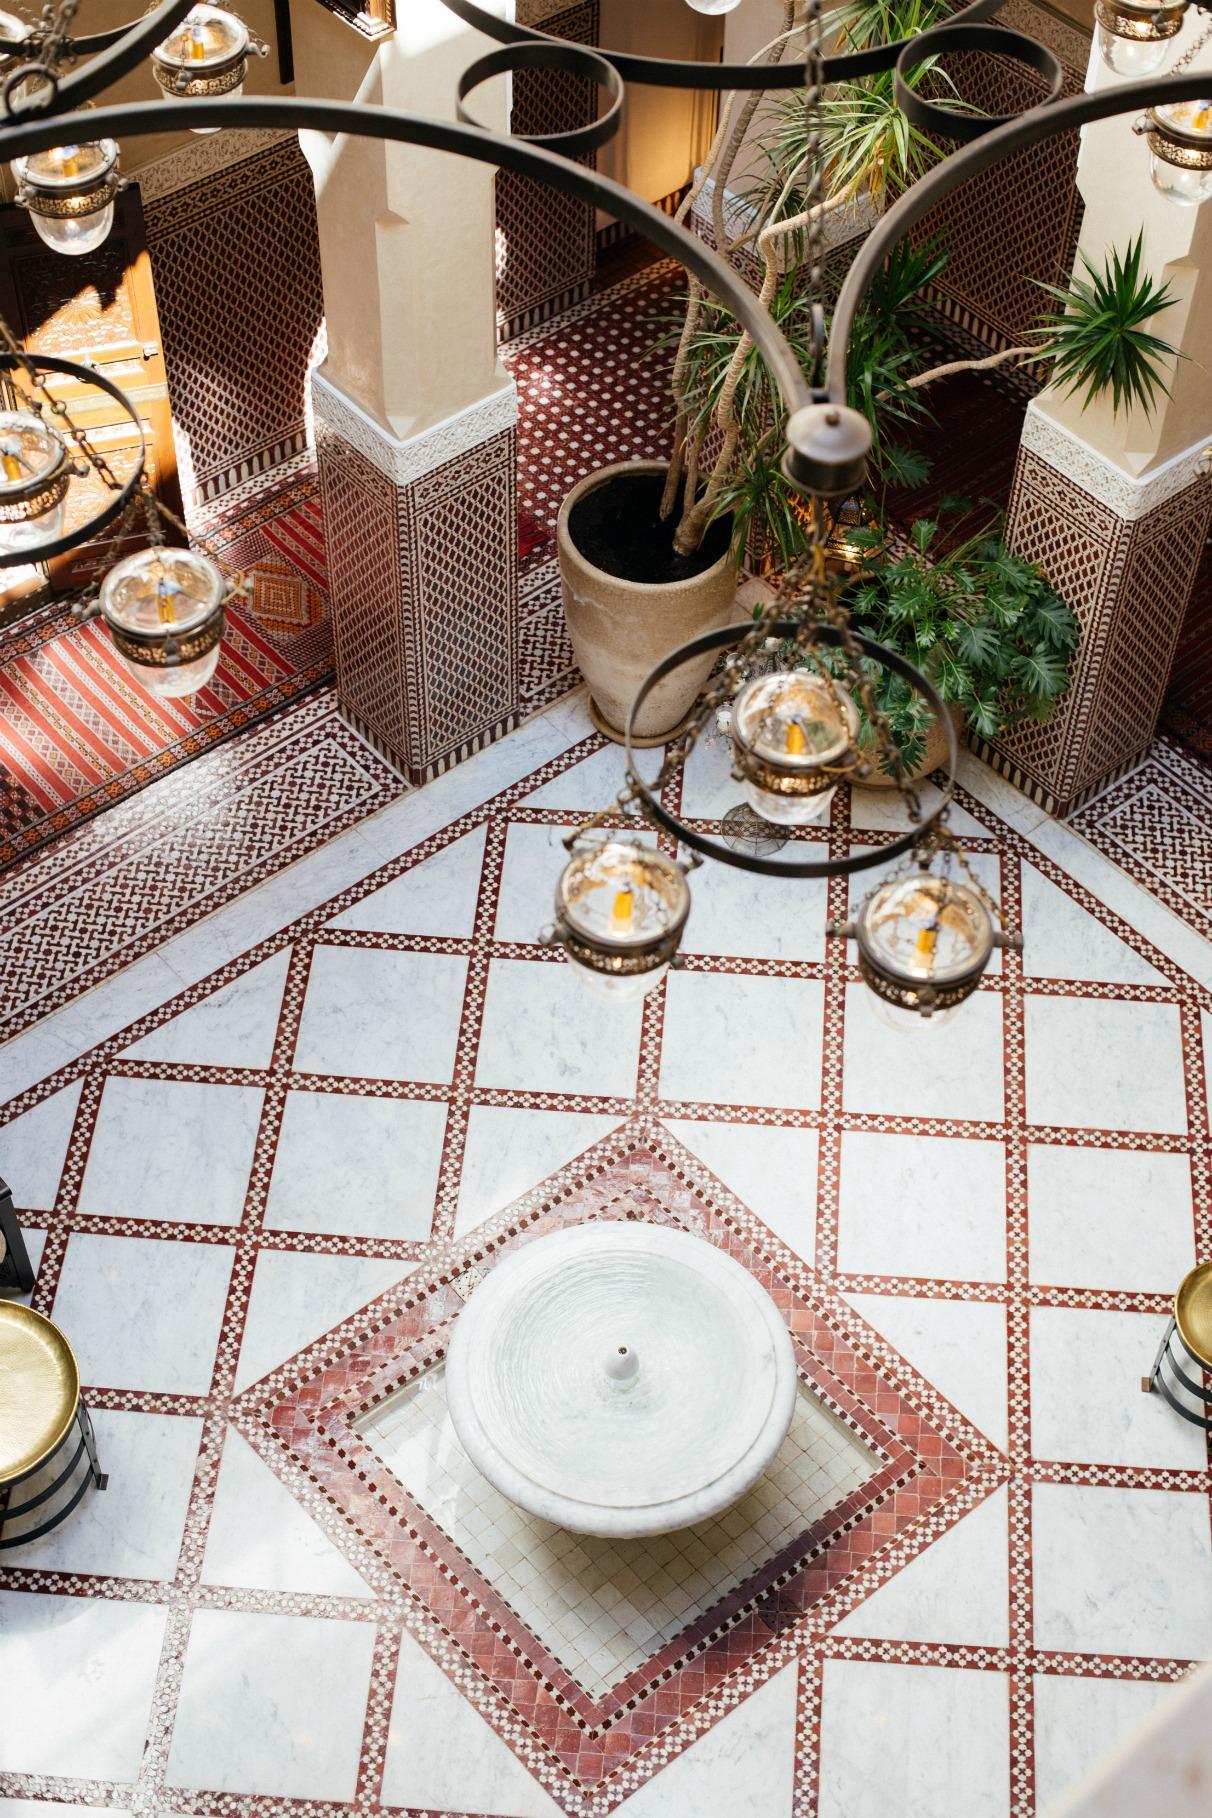 royal-mansour-hotel-luxury-marrakesch-marrakesh-morocco-edisa-shahini-disicouture-blog-20